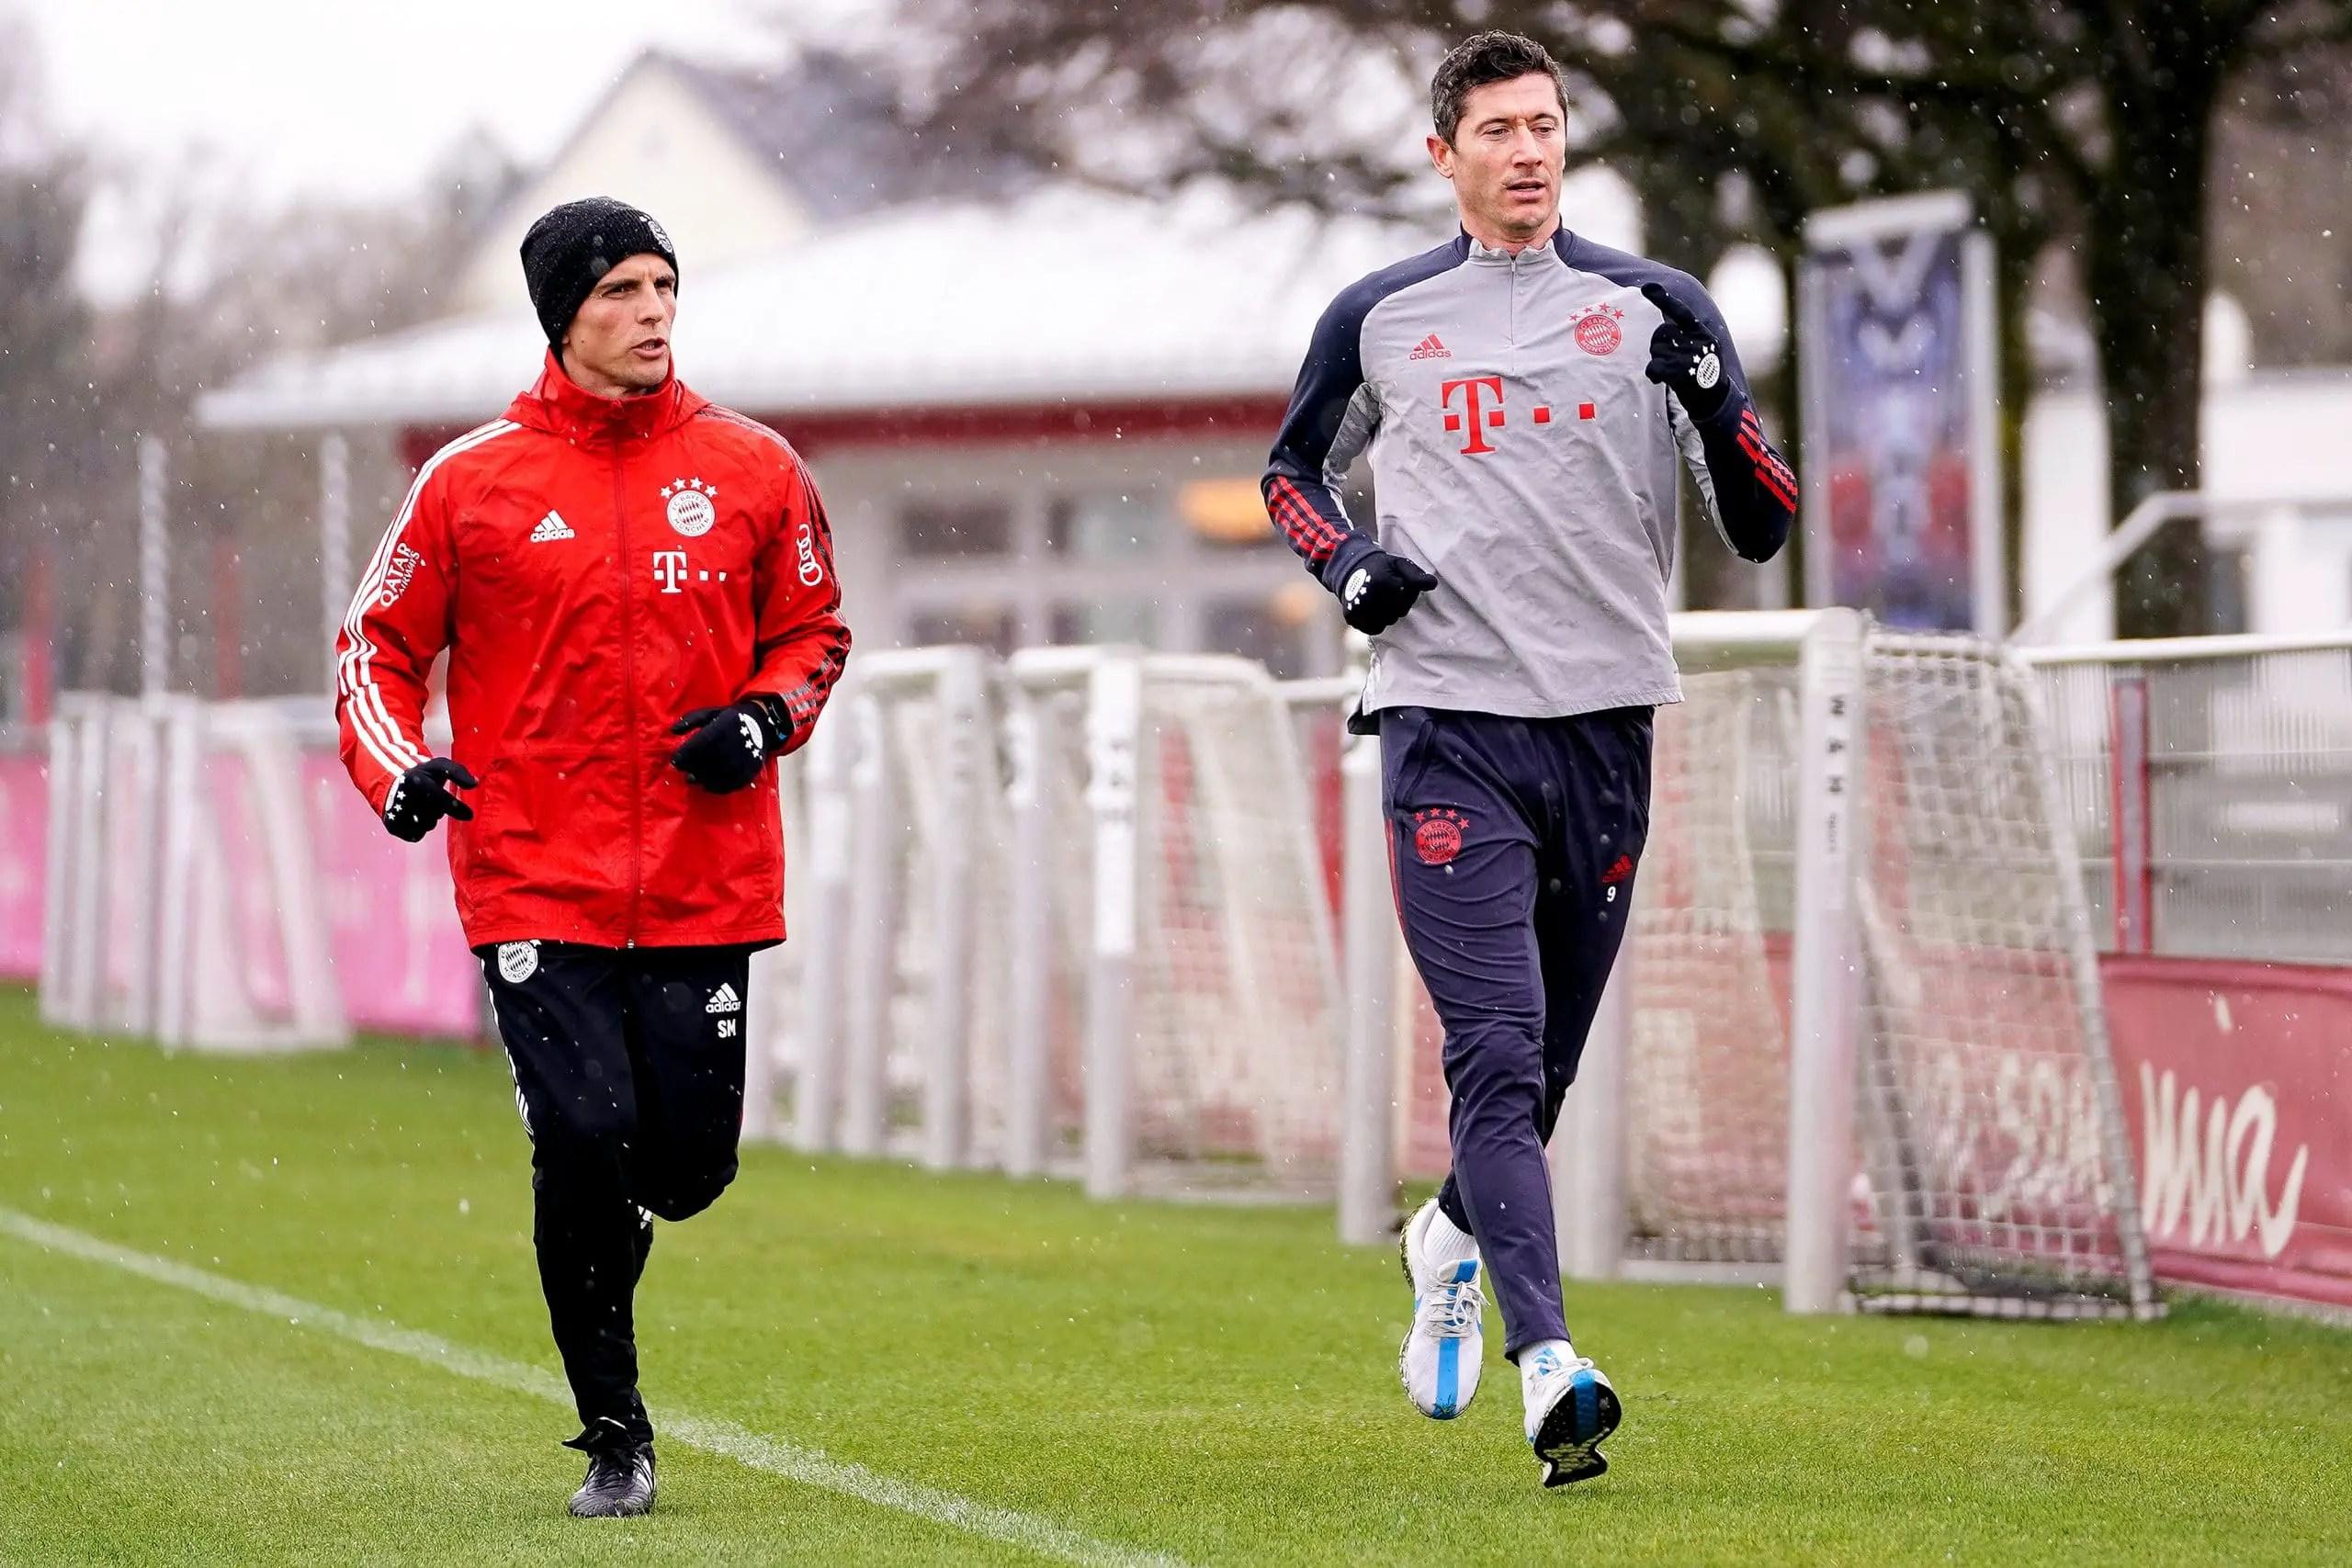 Lewandowski Interested In Chelsea Move